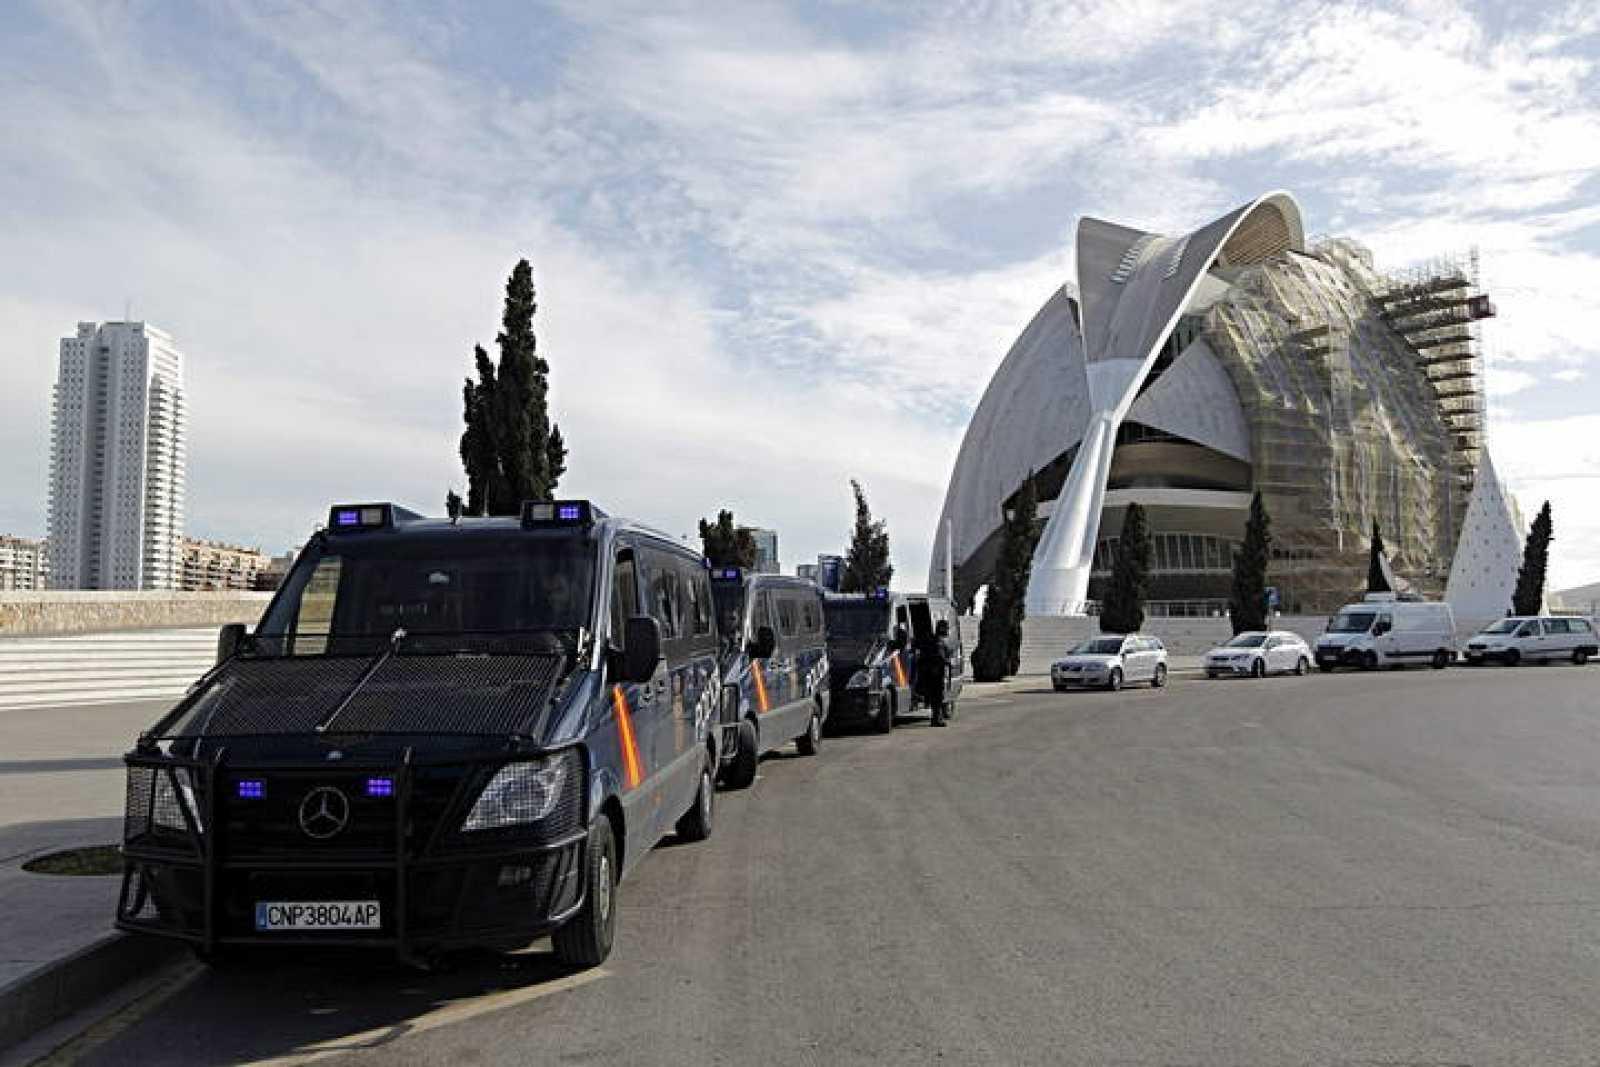 La Policía registra el Palau de les Arts